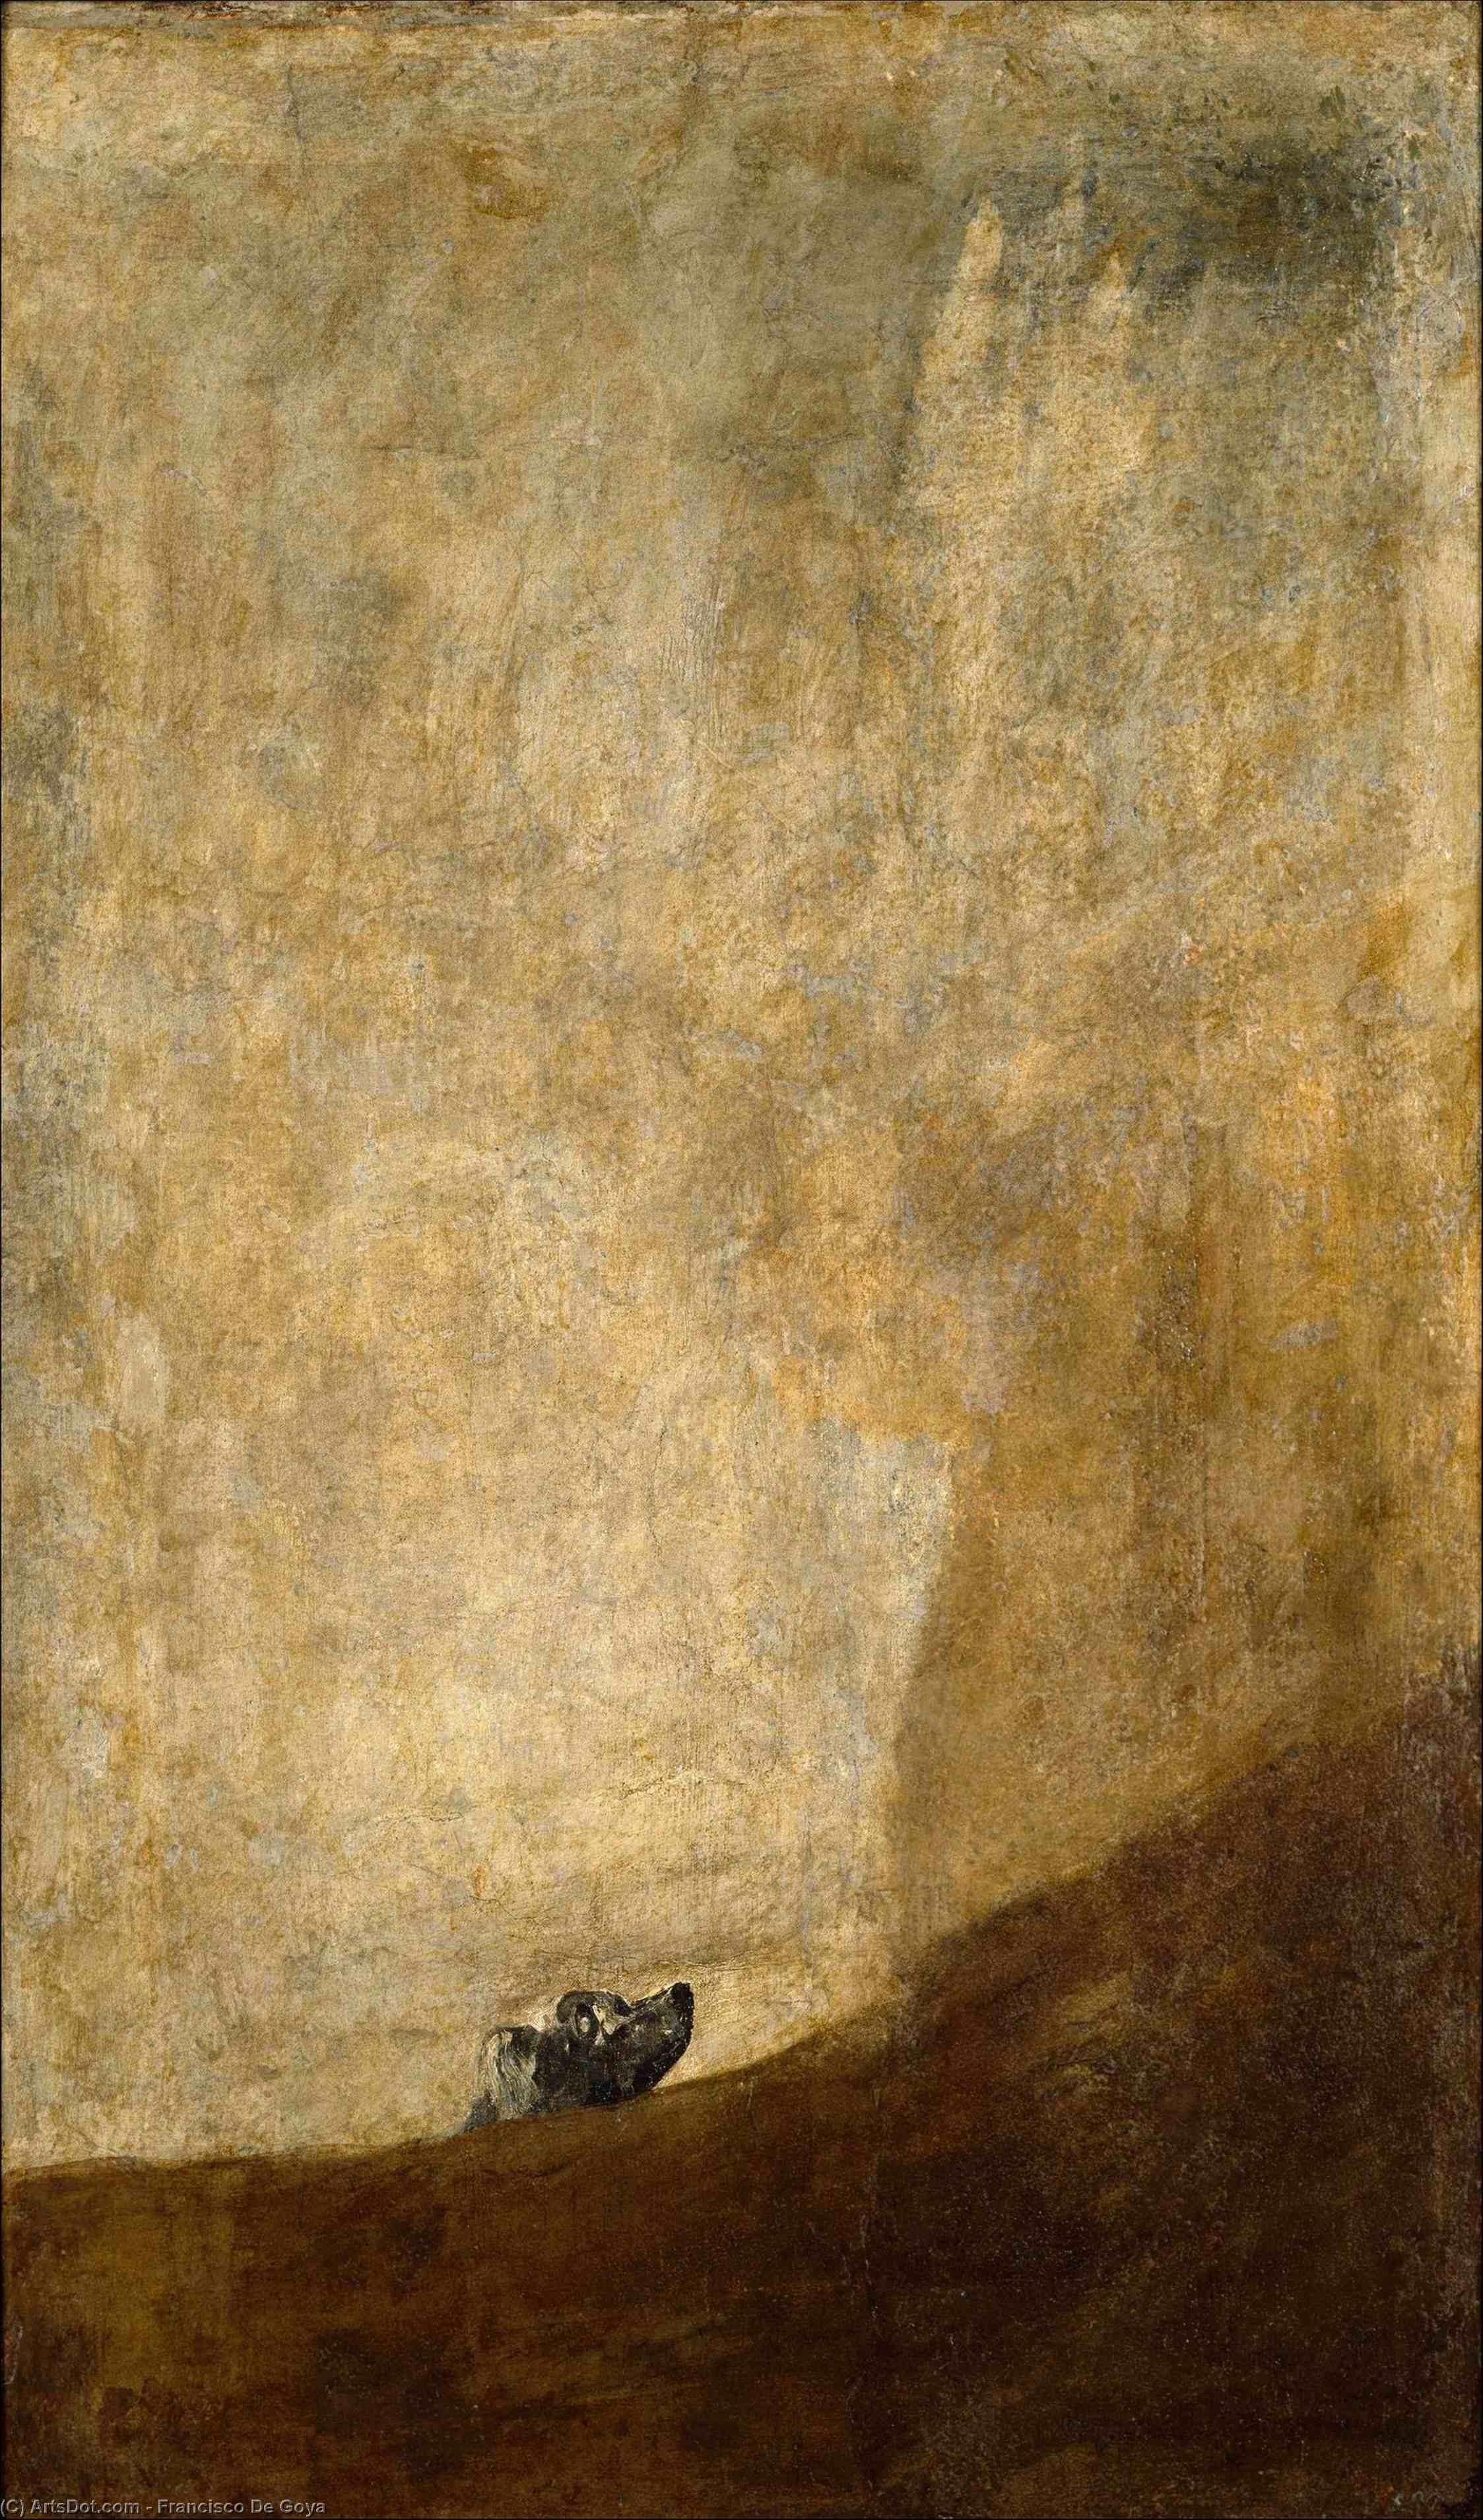 Wikioo.org - The Encyclopedia of Fine Arts - Painting, Artwork by Francisco De Goya - Dog